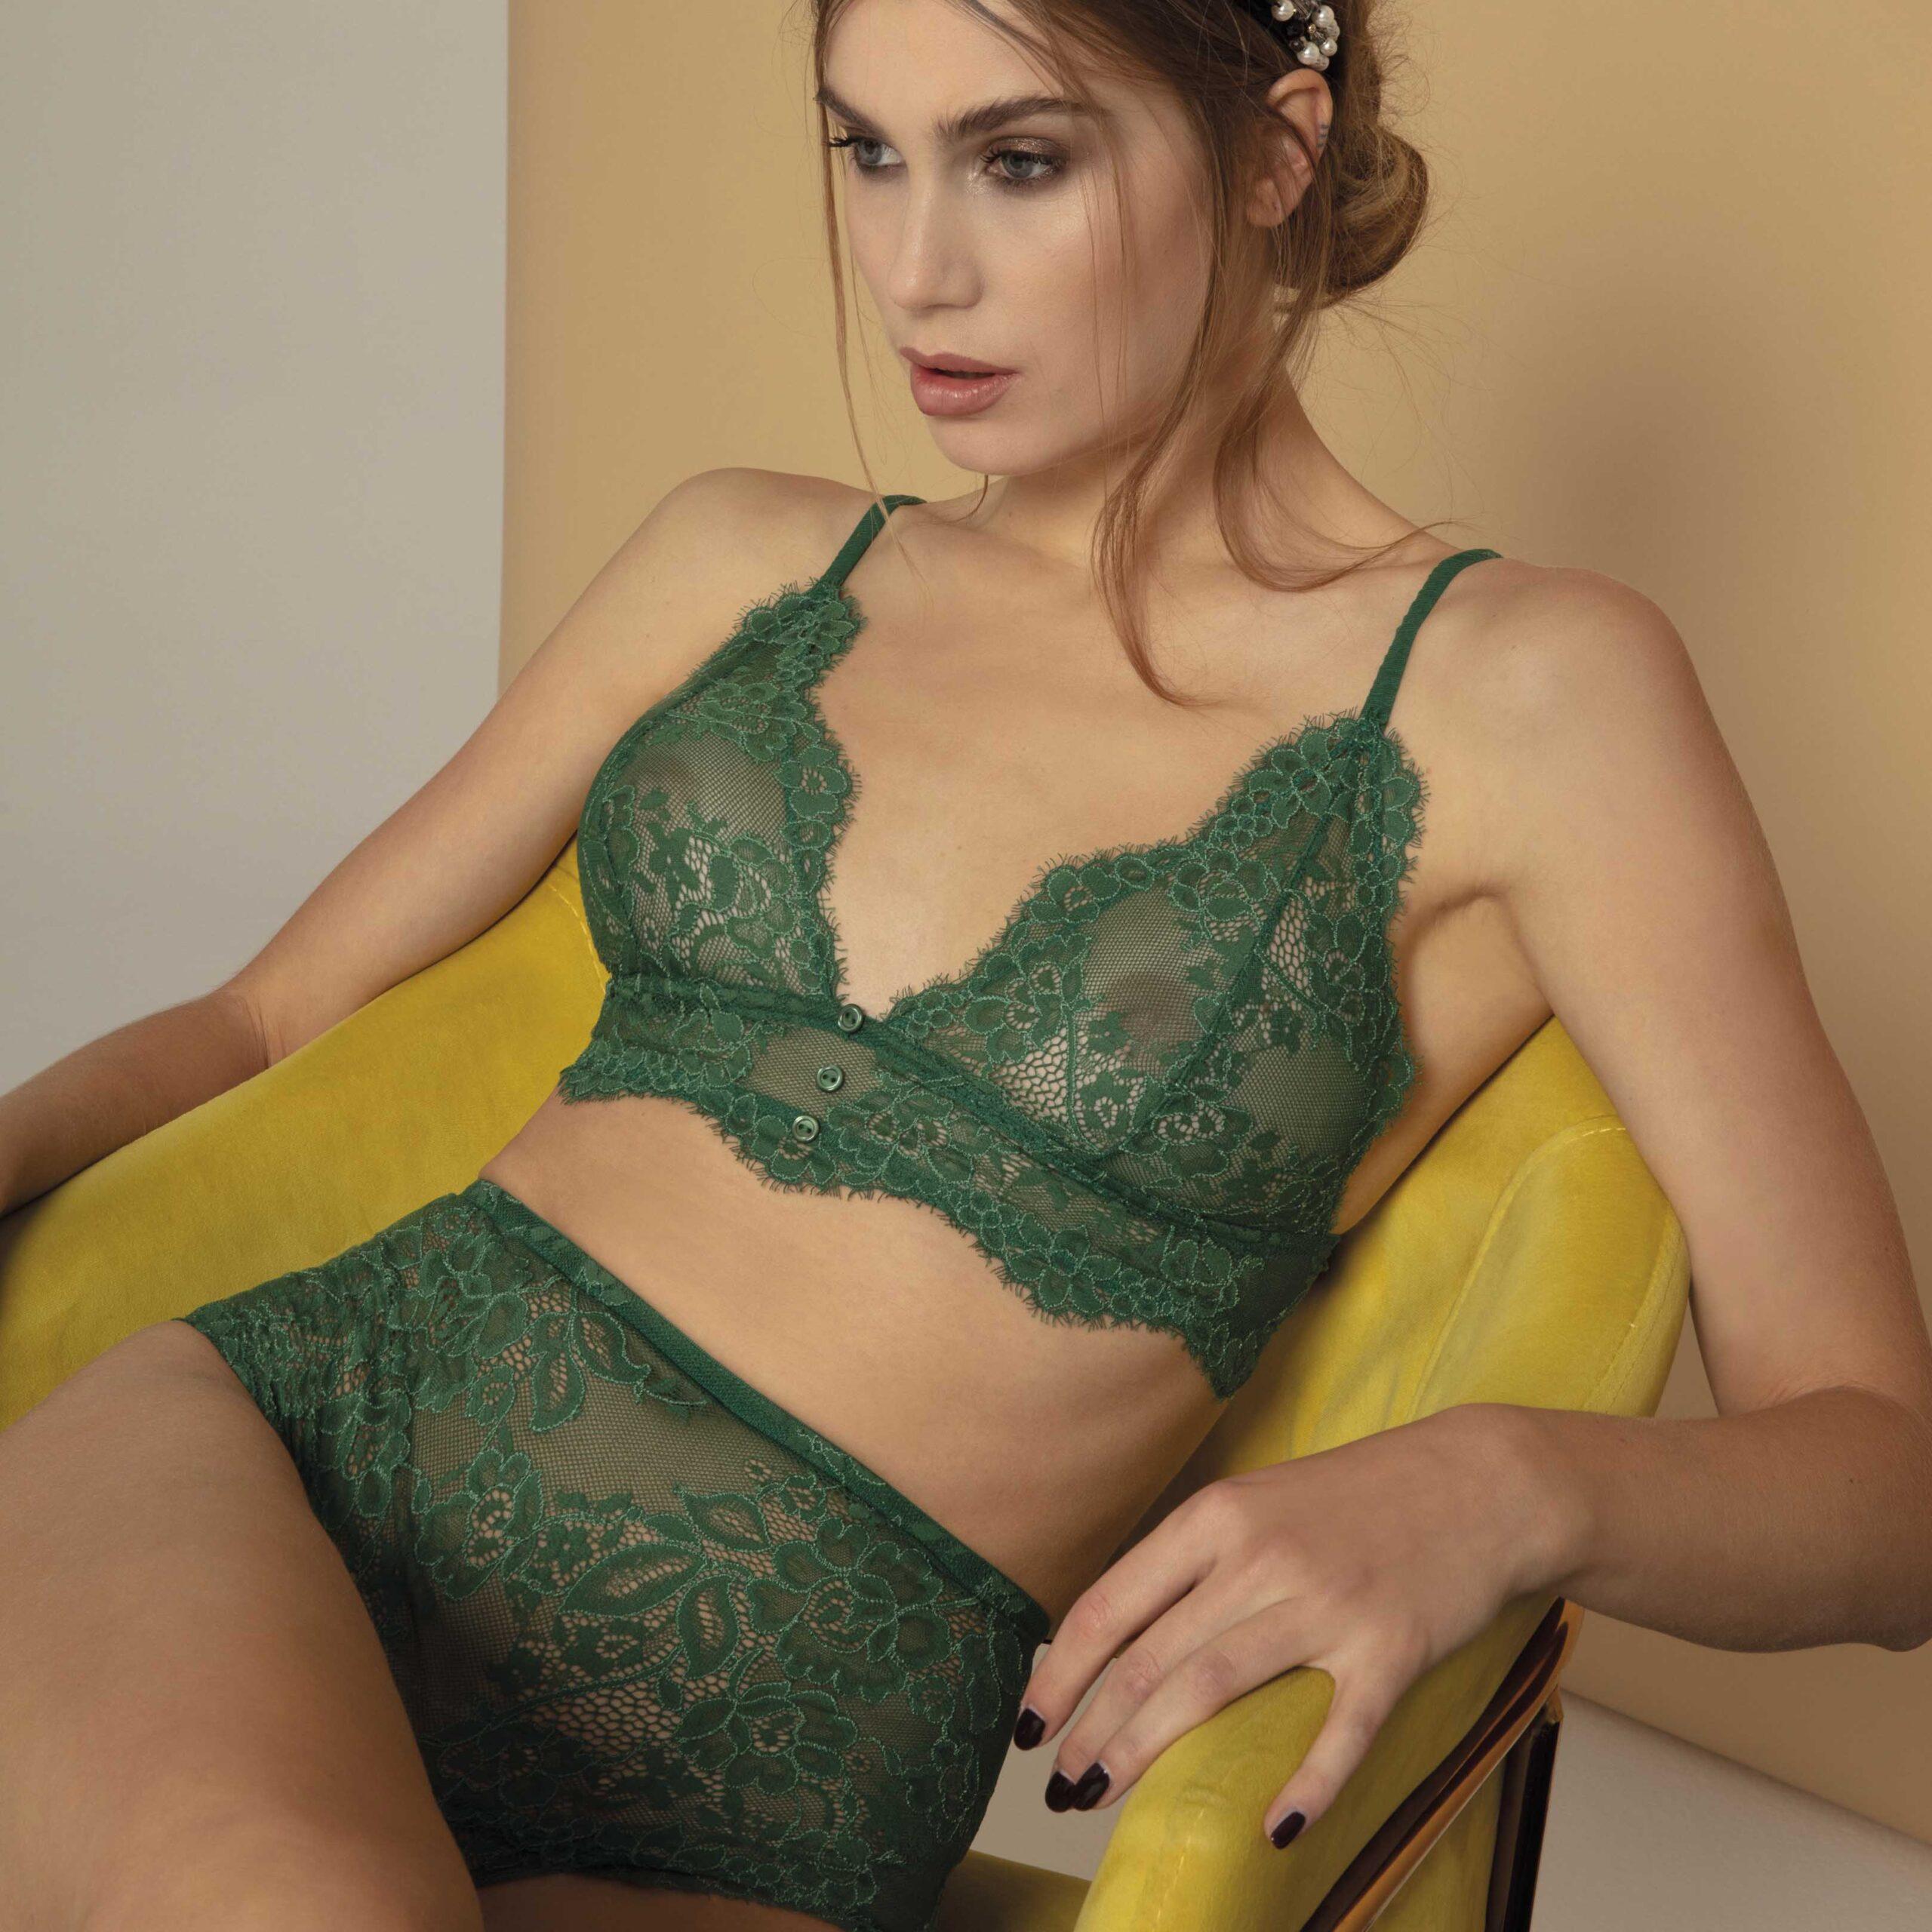 completino-pizzo-verde-valery-lingerie-biancheria-intima-donna-autunno-inverno-2022